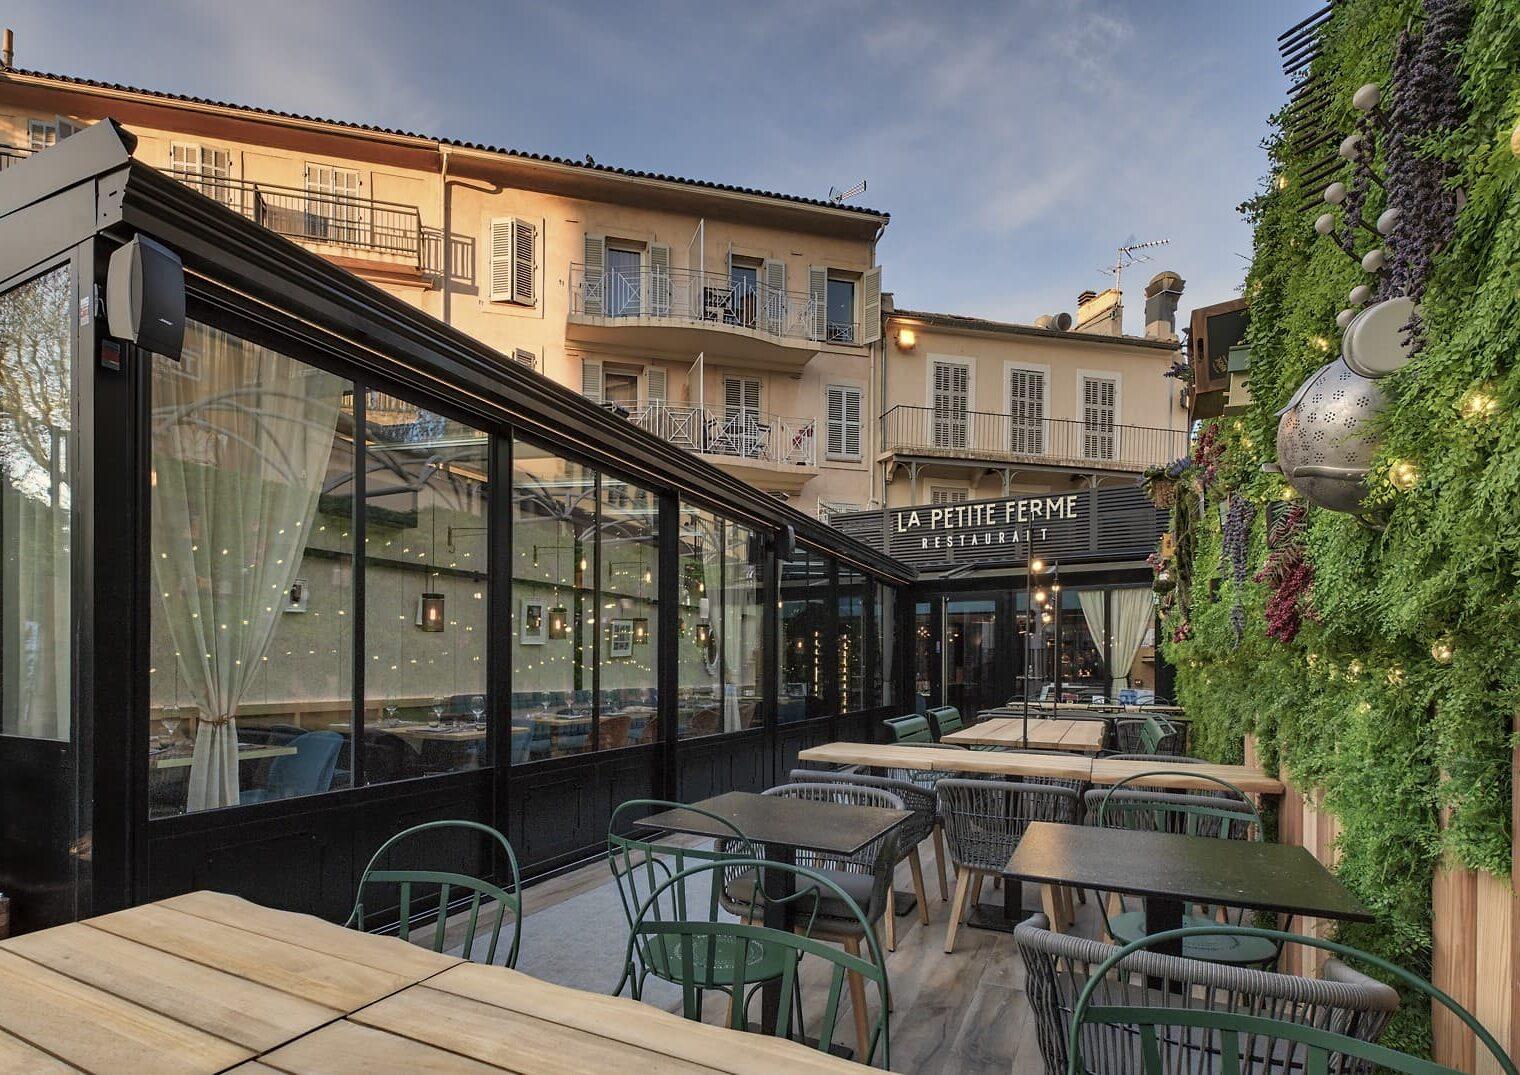 Terrasse du restaurant La Petite Ferme